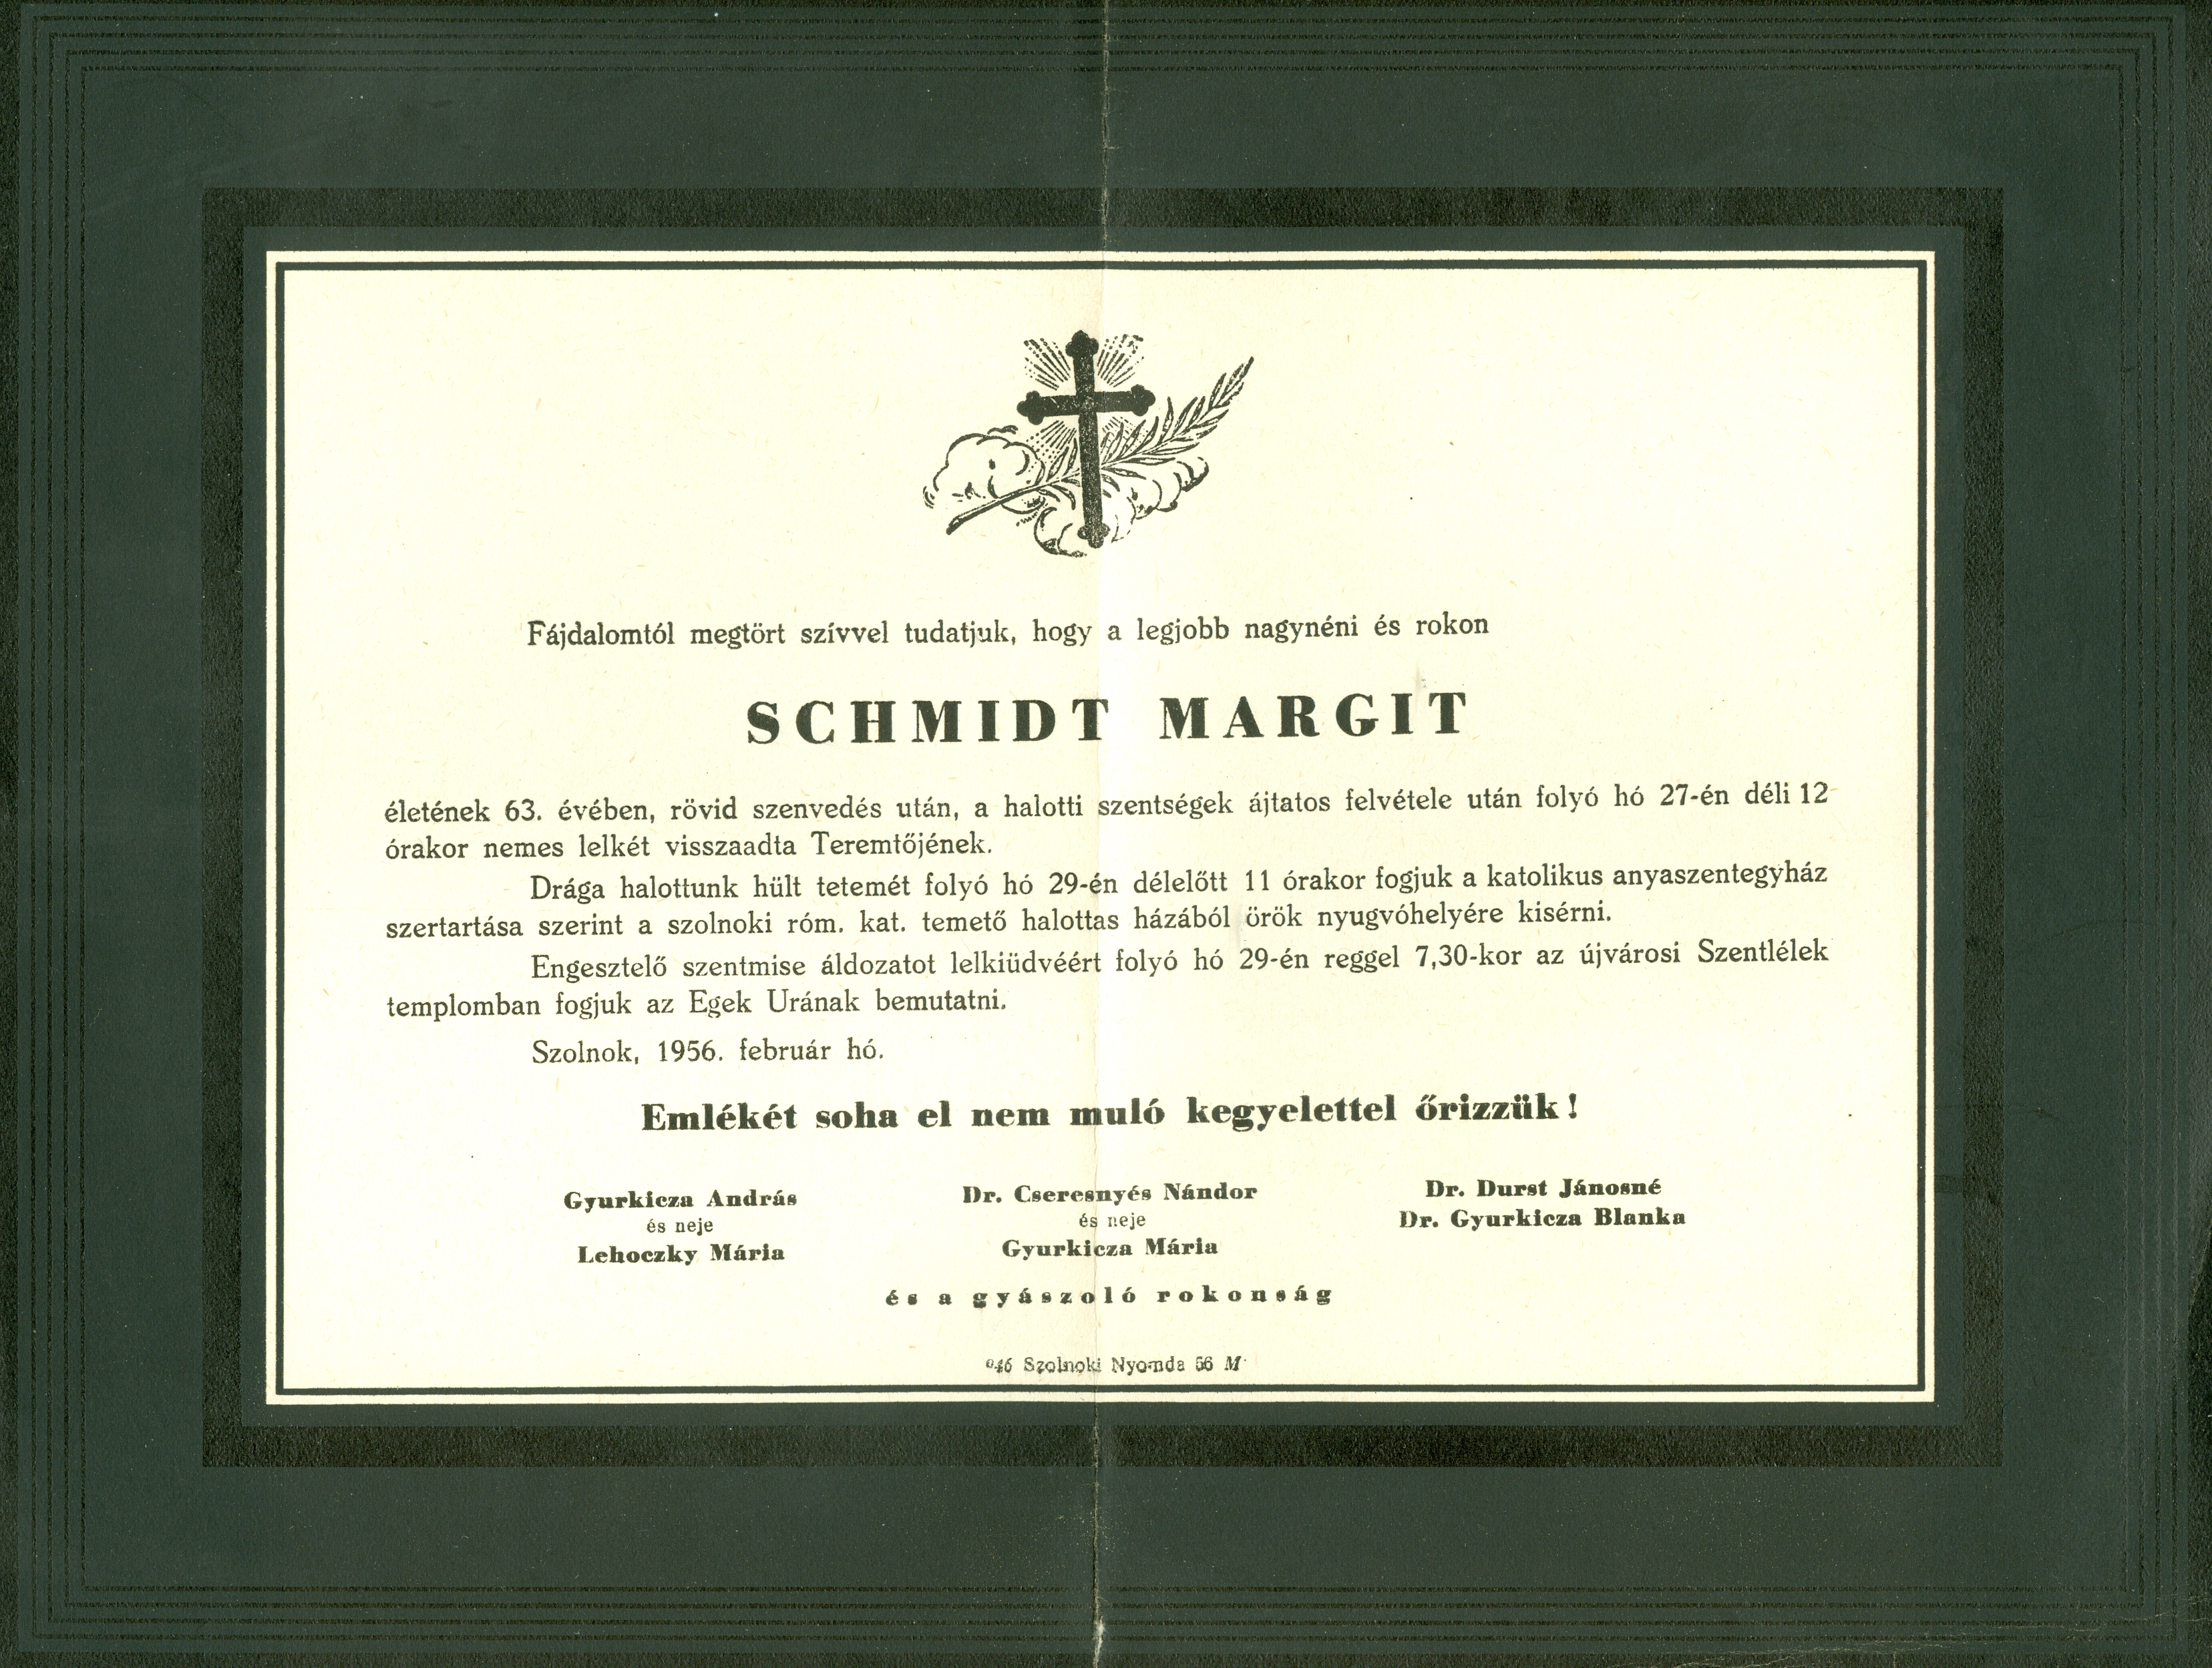 Schmidt Margit